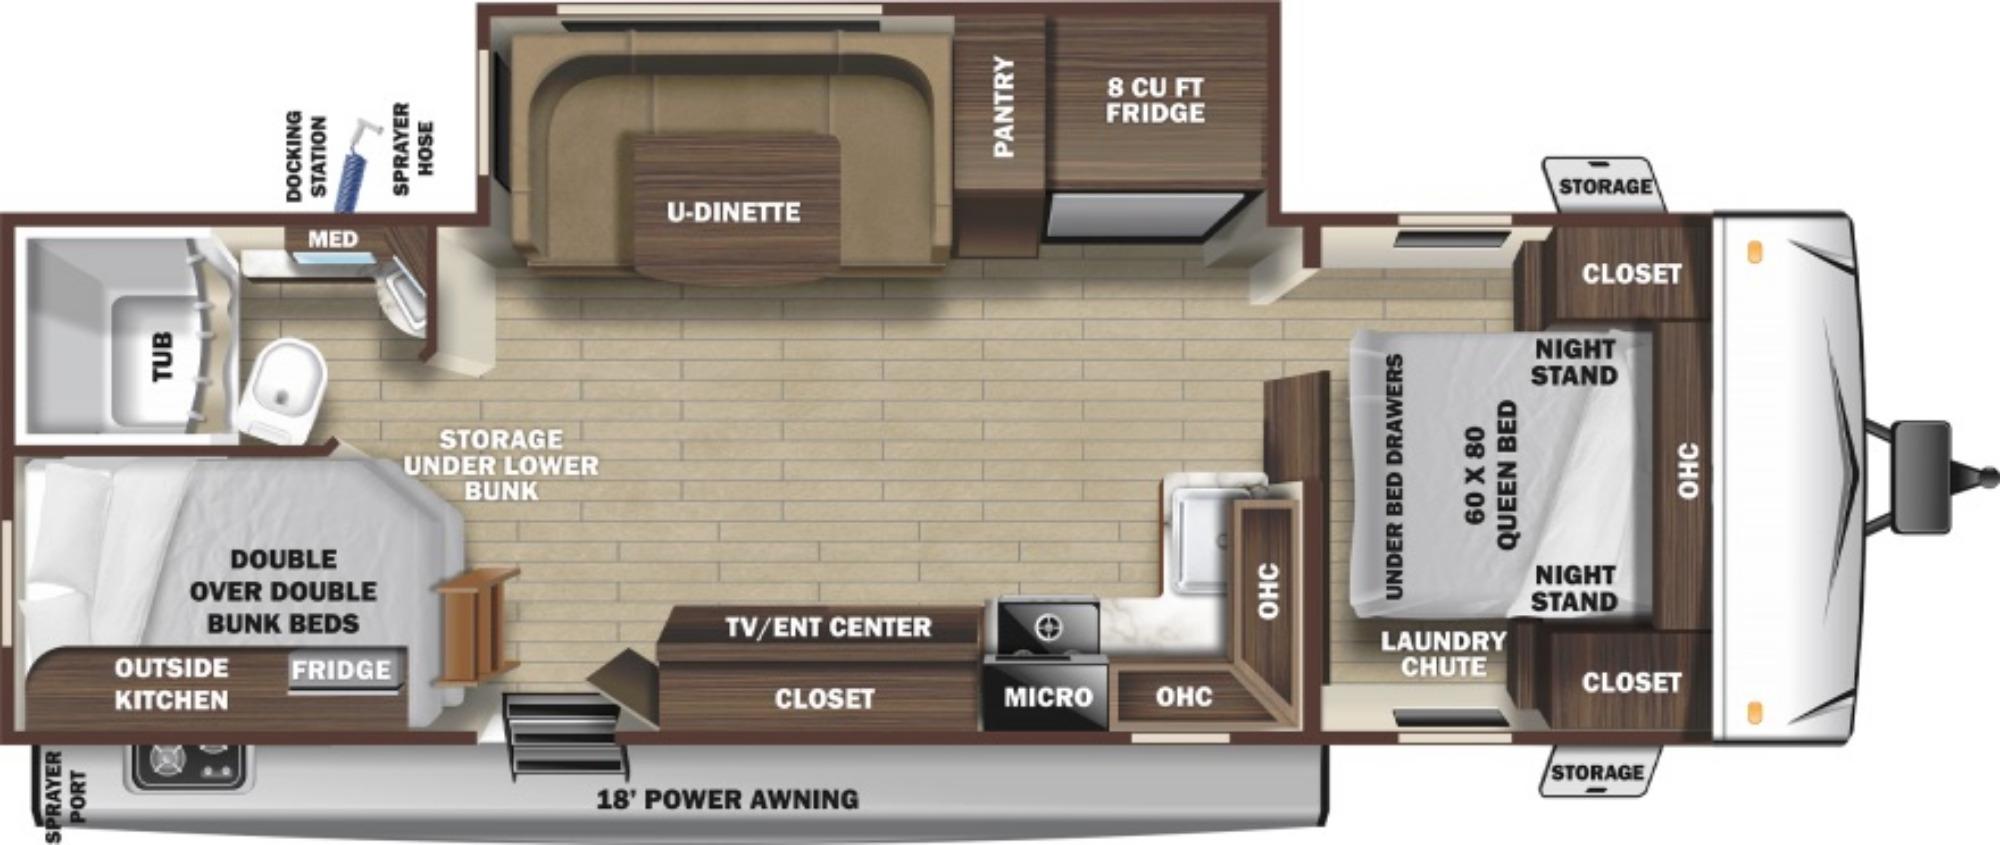 View Floor Plan for 2021 HIGHLAND RIDGE OPEN RANGE LITE 241BH